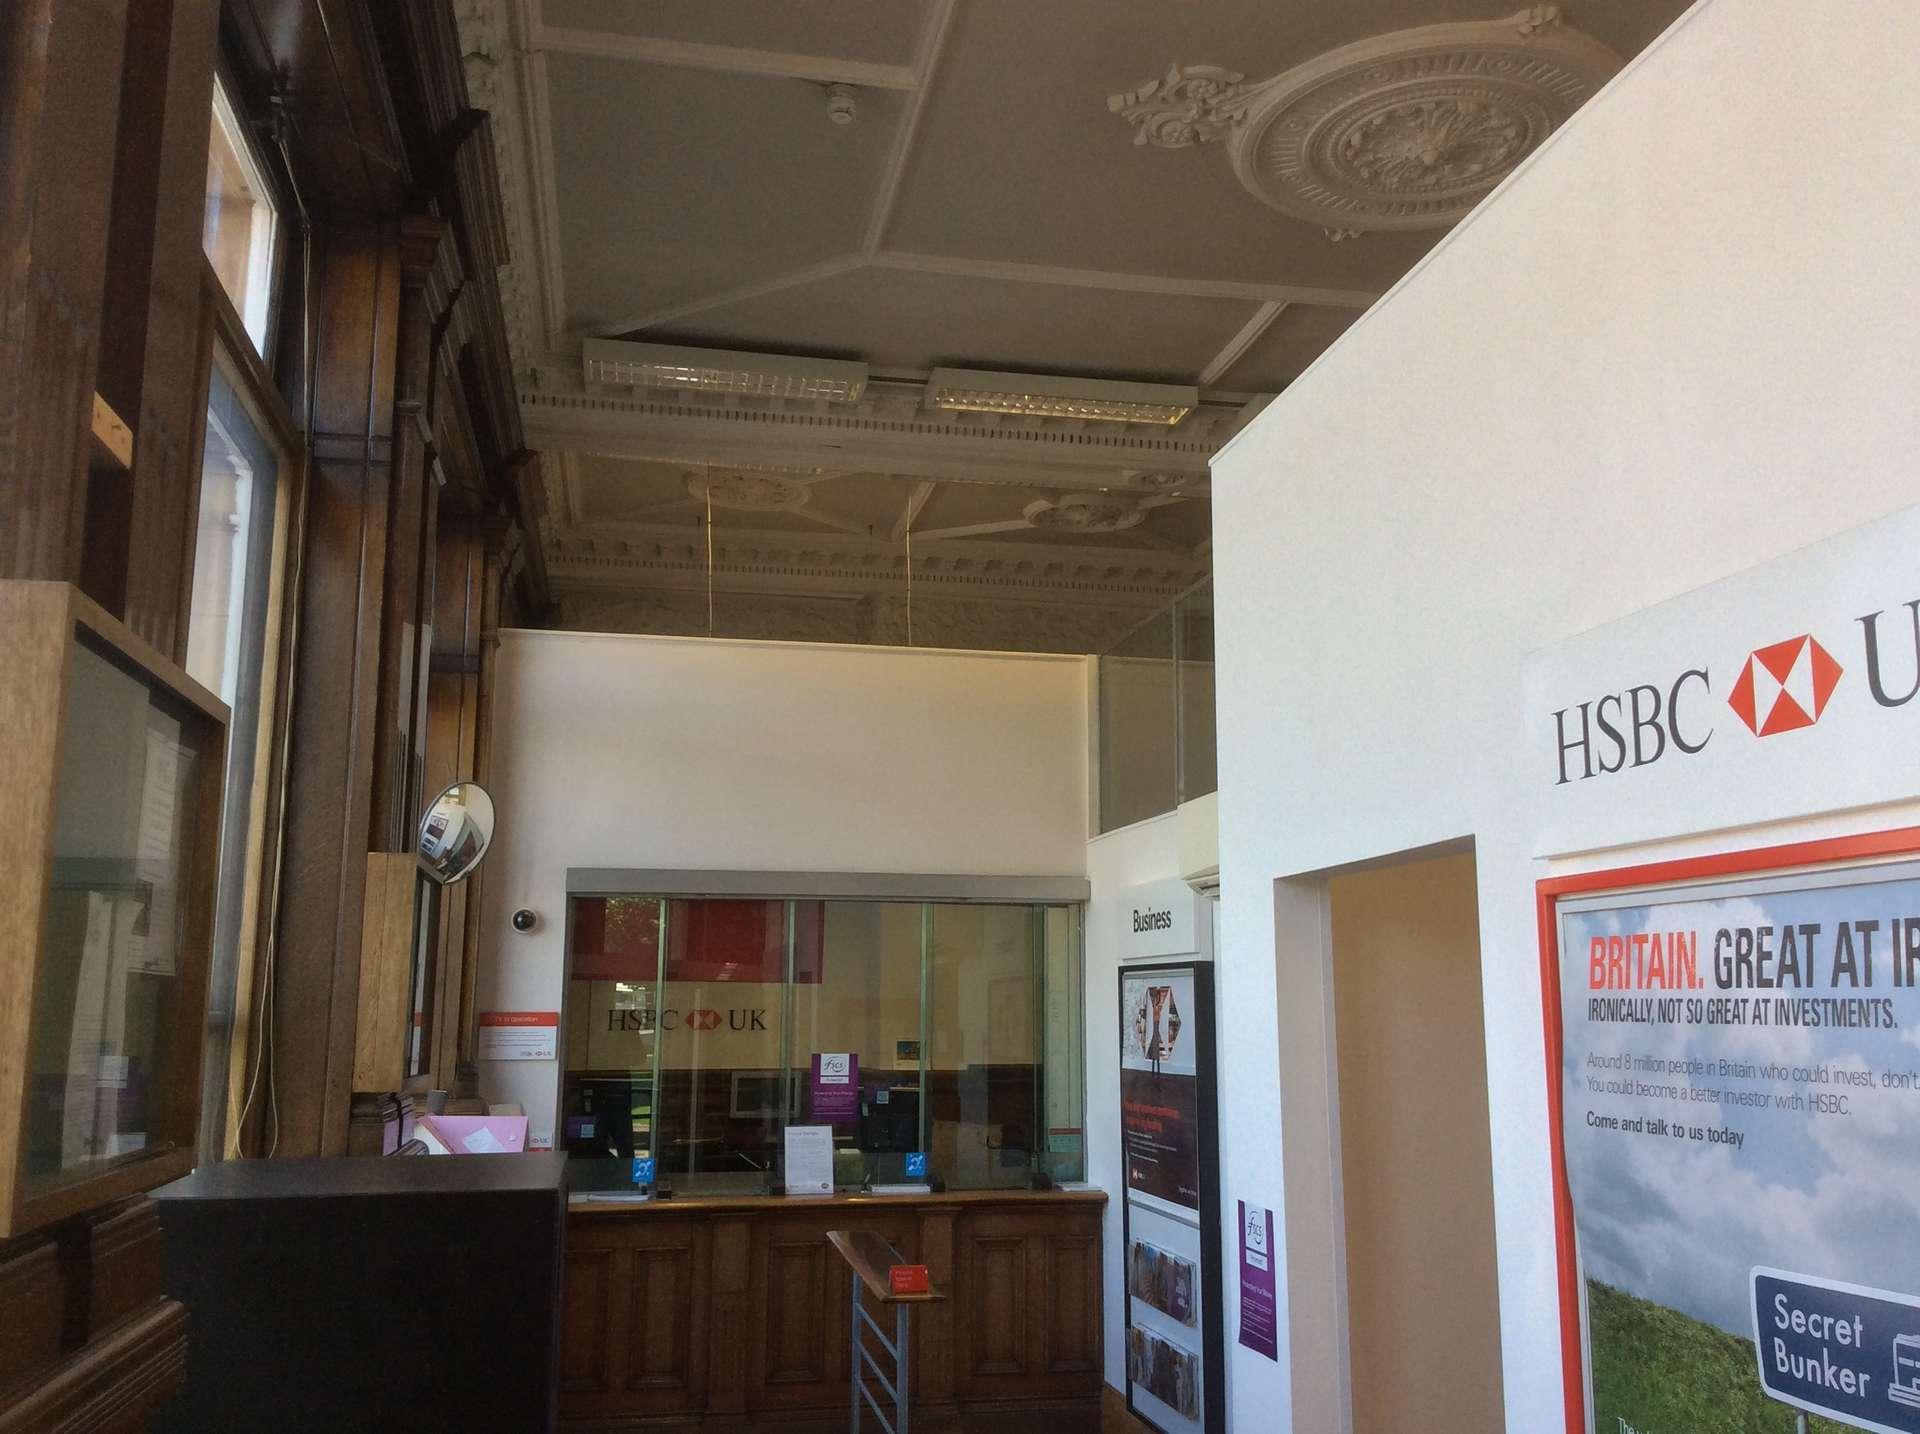 Savills | H S B C, 14 Bradford Road, Cleckheaton | Properties for sale